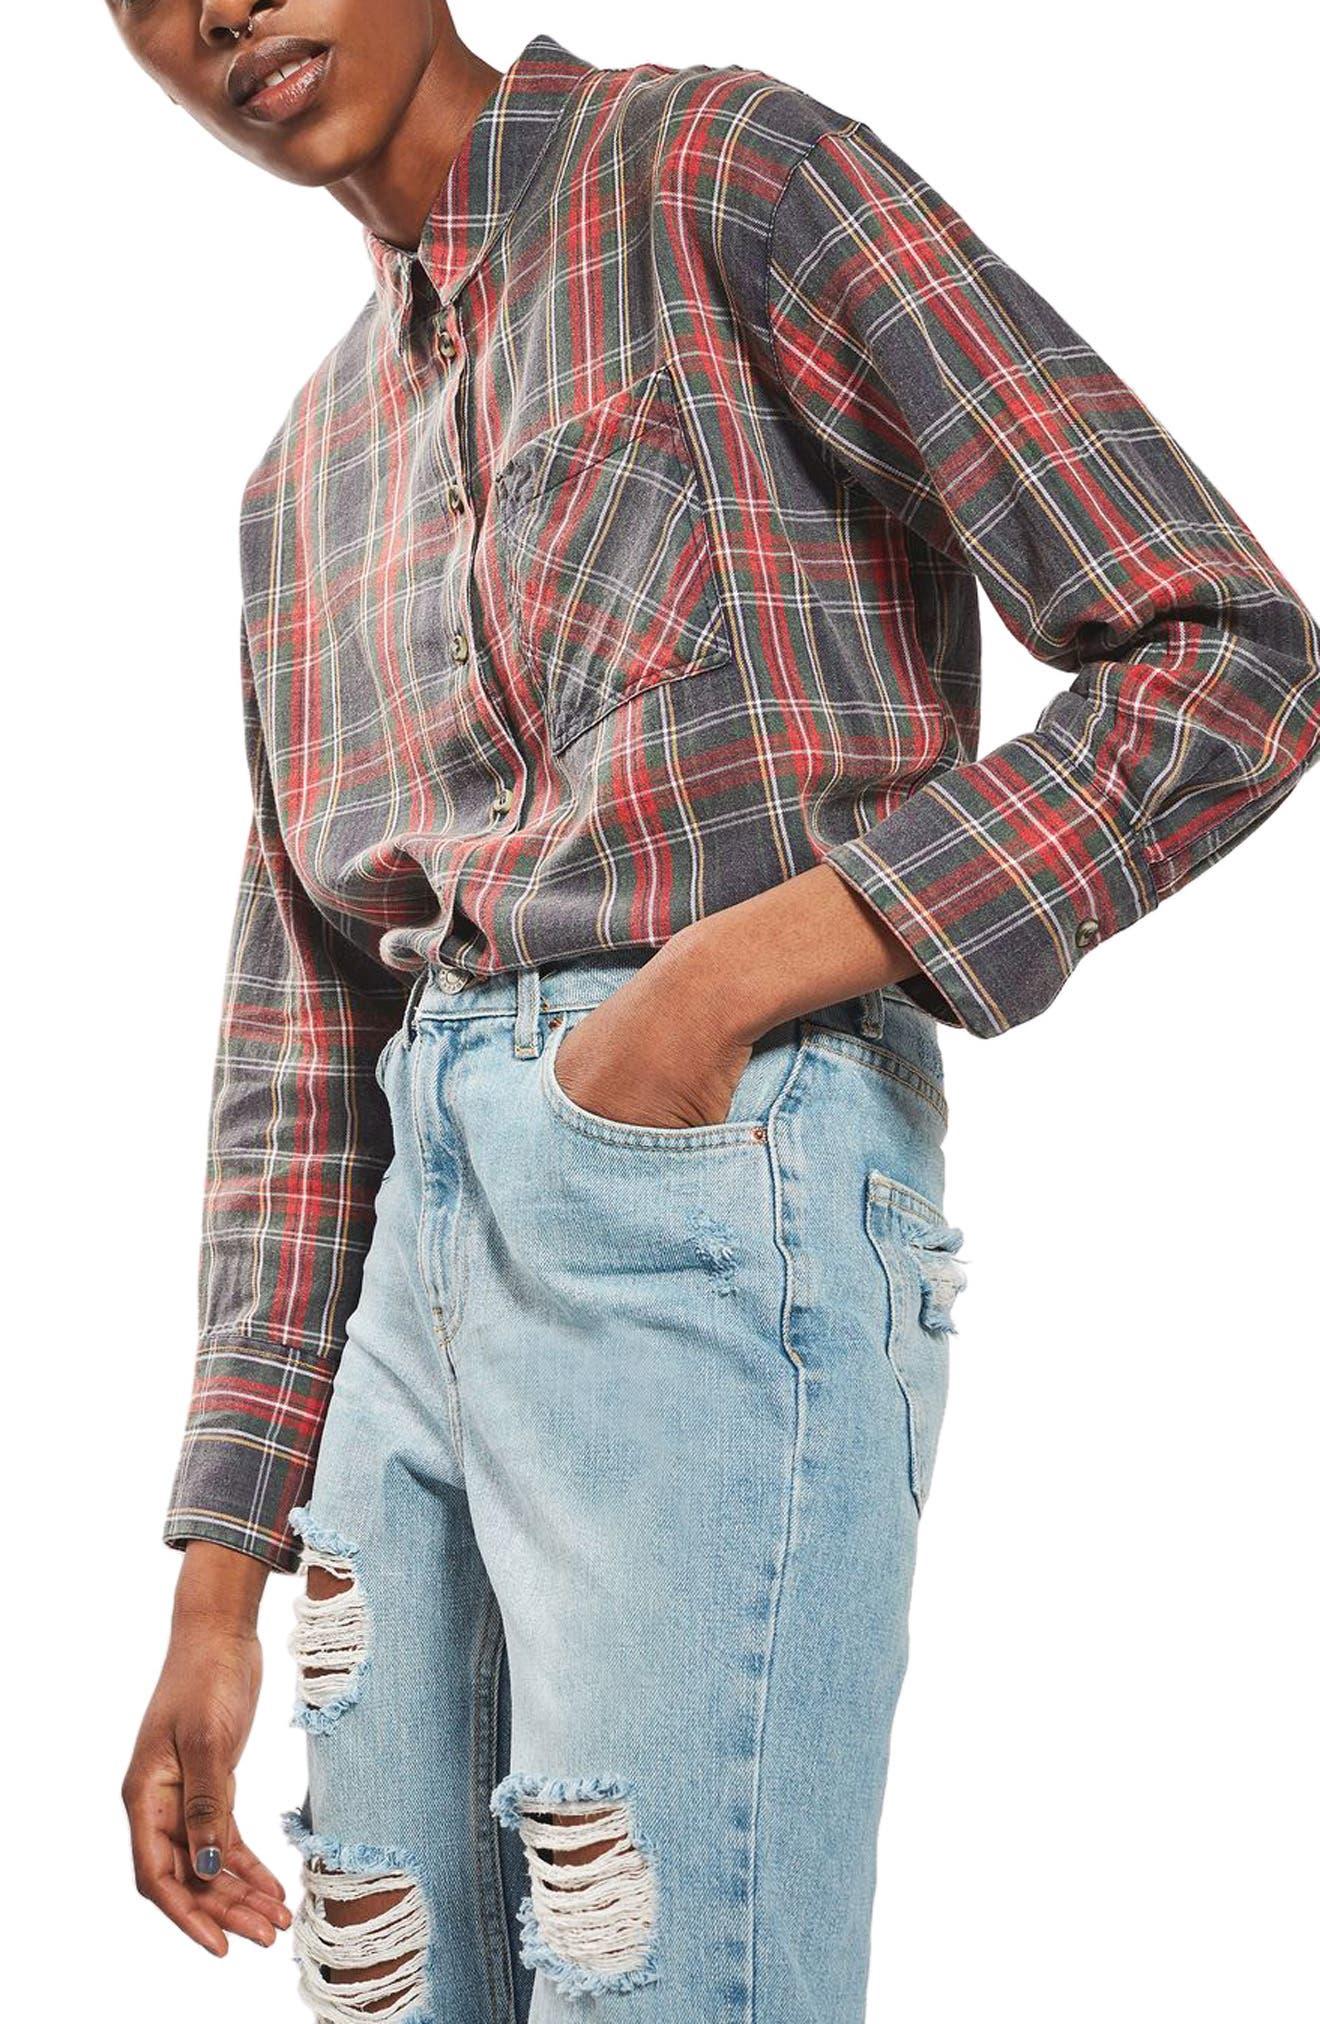 Topshop Washed Tartan Shirt